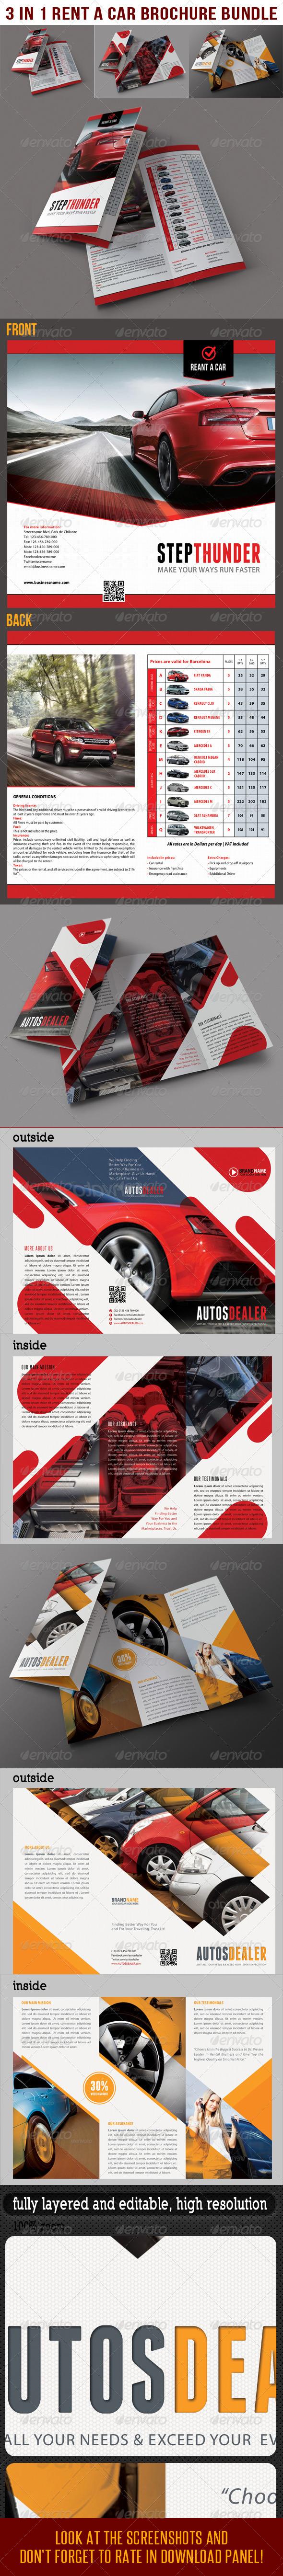 3 in 1 Rent A Car Brochure Bundle 03